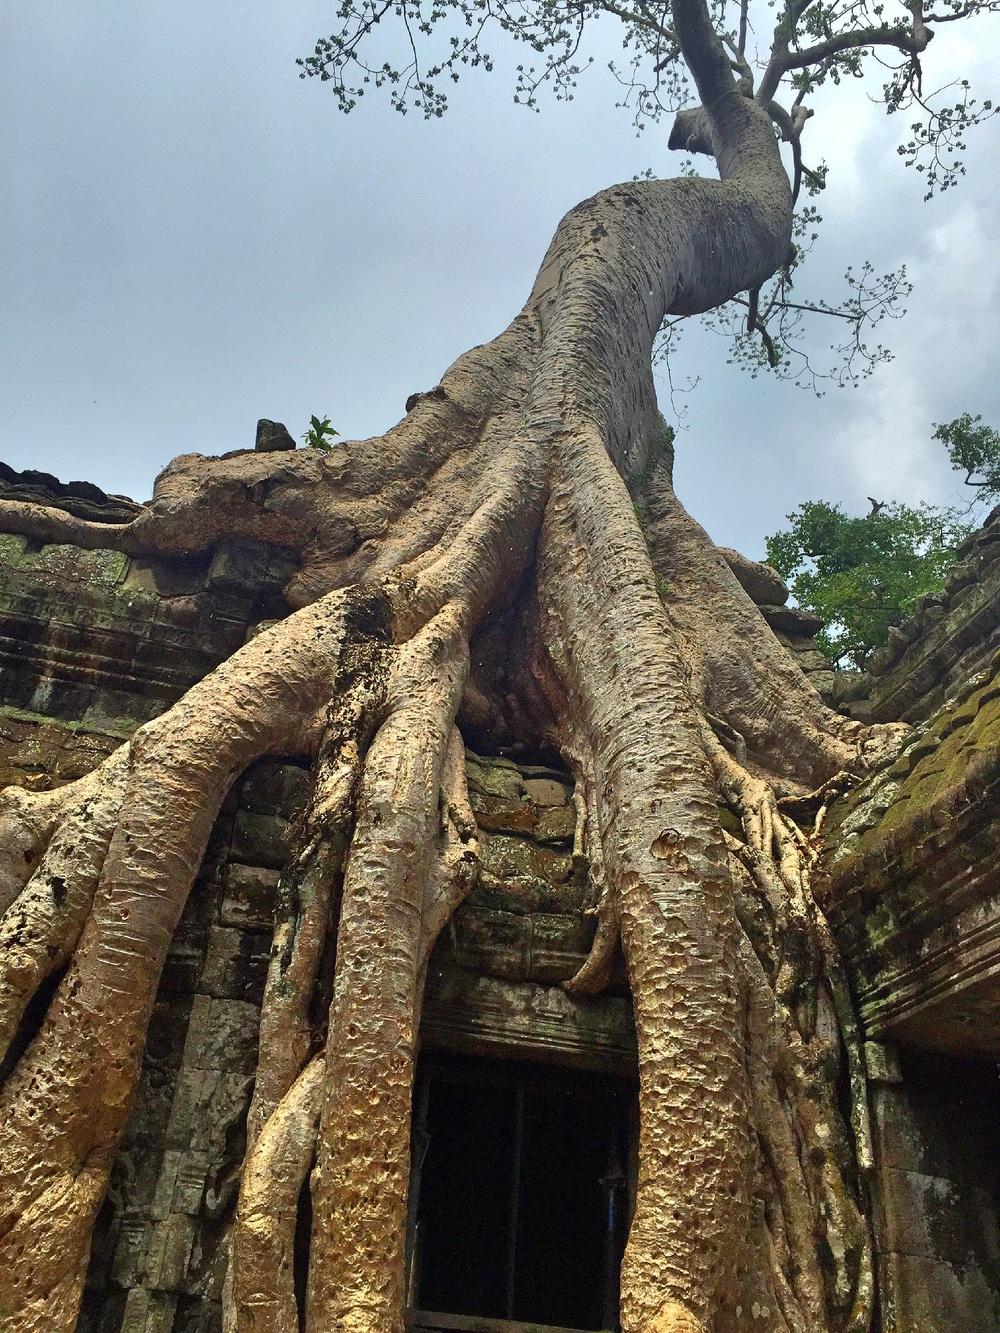 Golden Trees, Angkor Wat, Cambodia